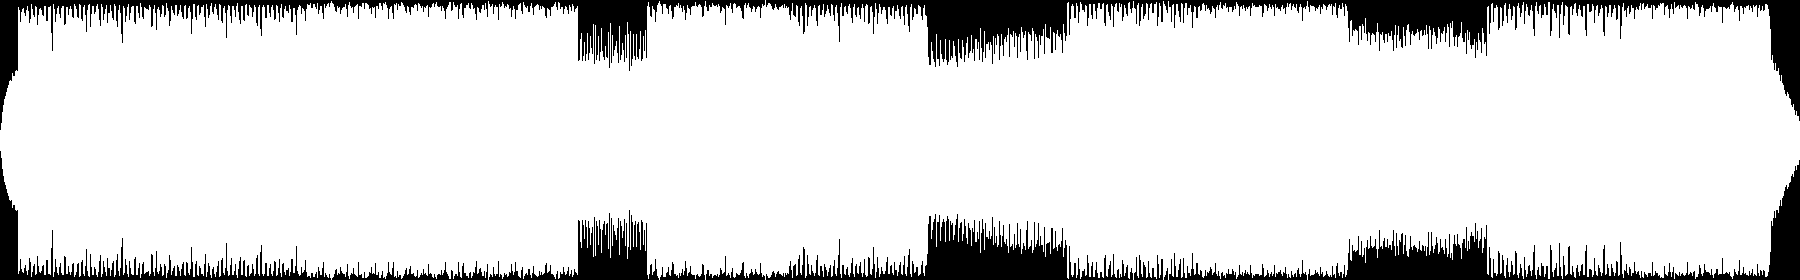 Swedish House Loops audio waveform